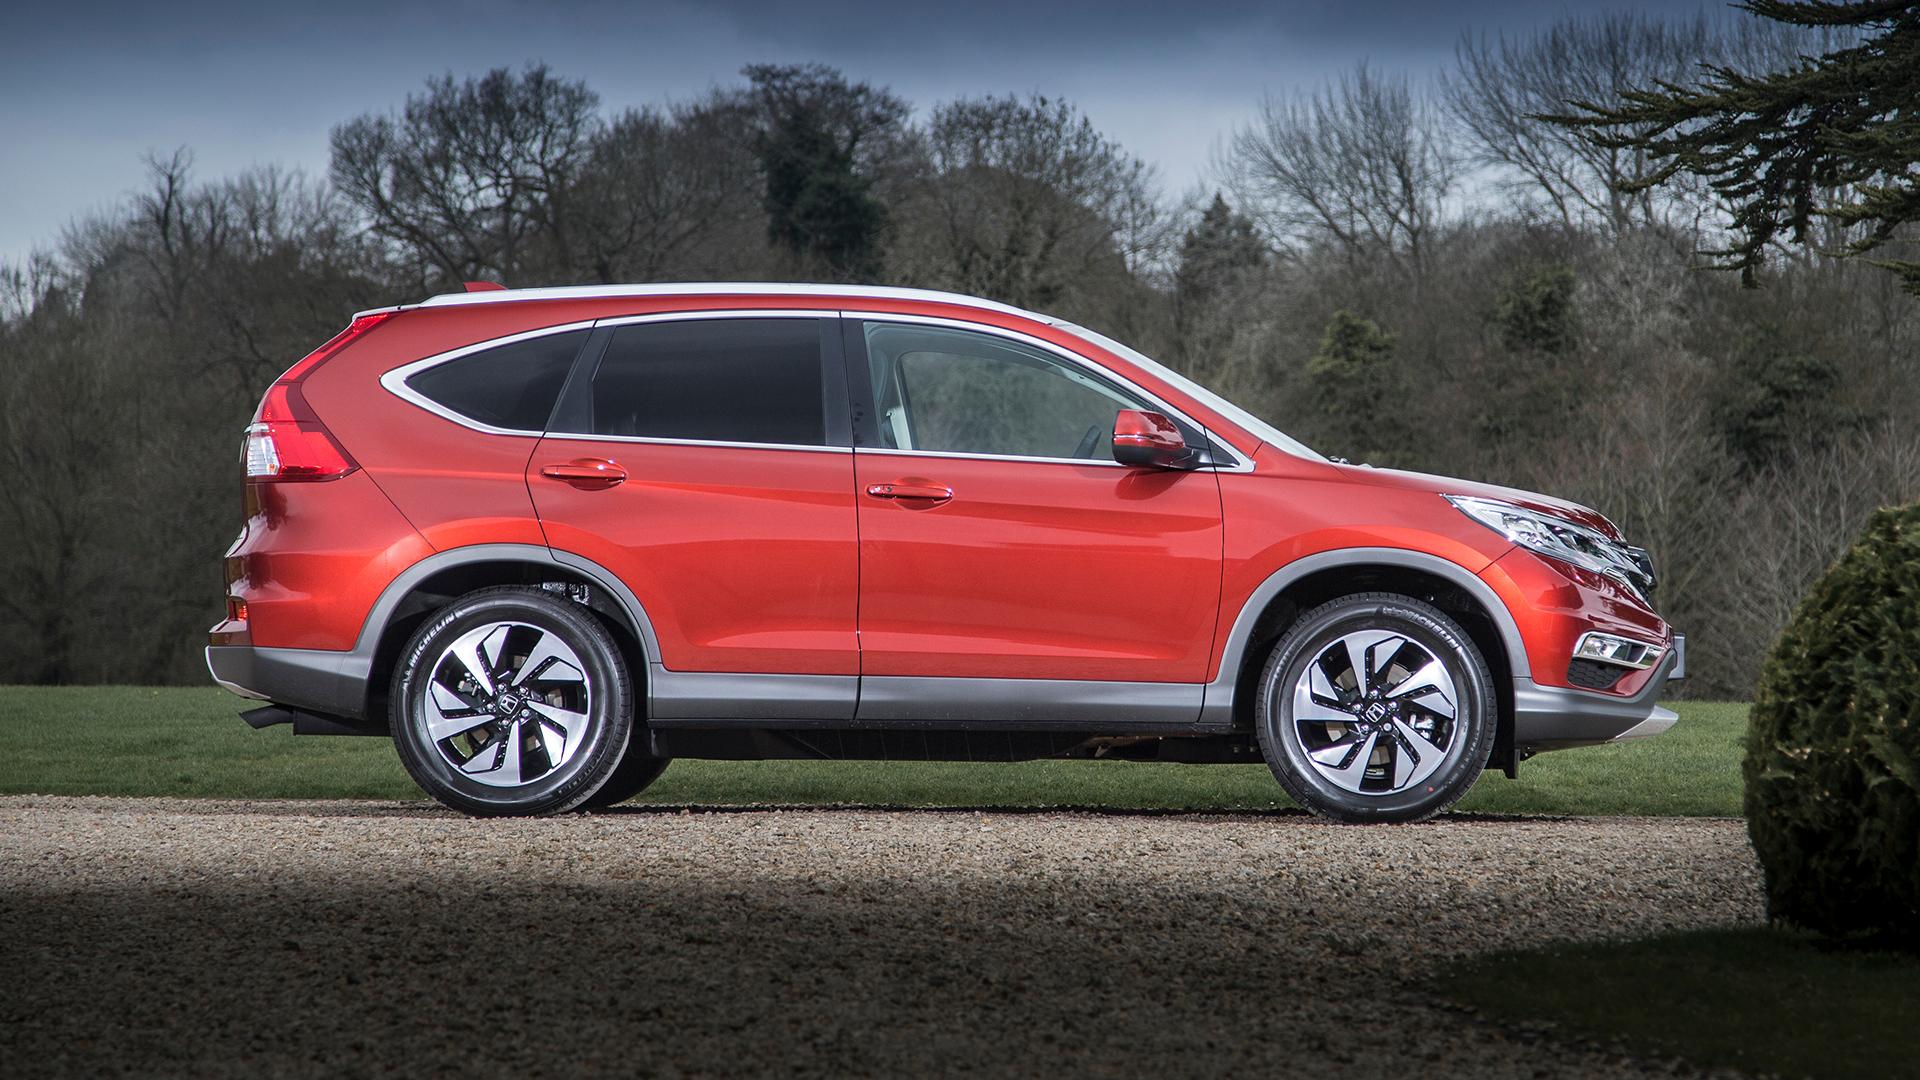 Black Honda CR-V used cars for sale on Auto Trader UK